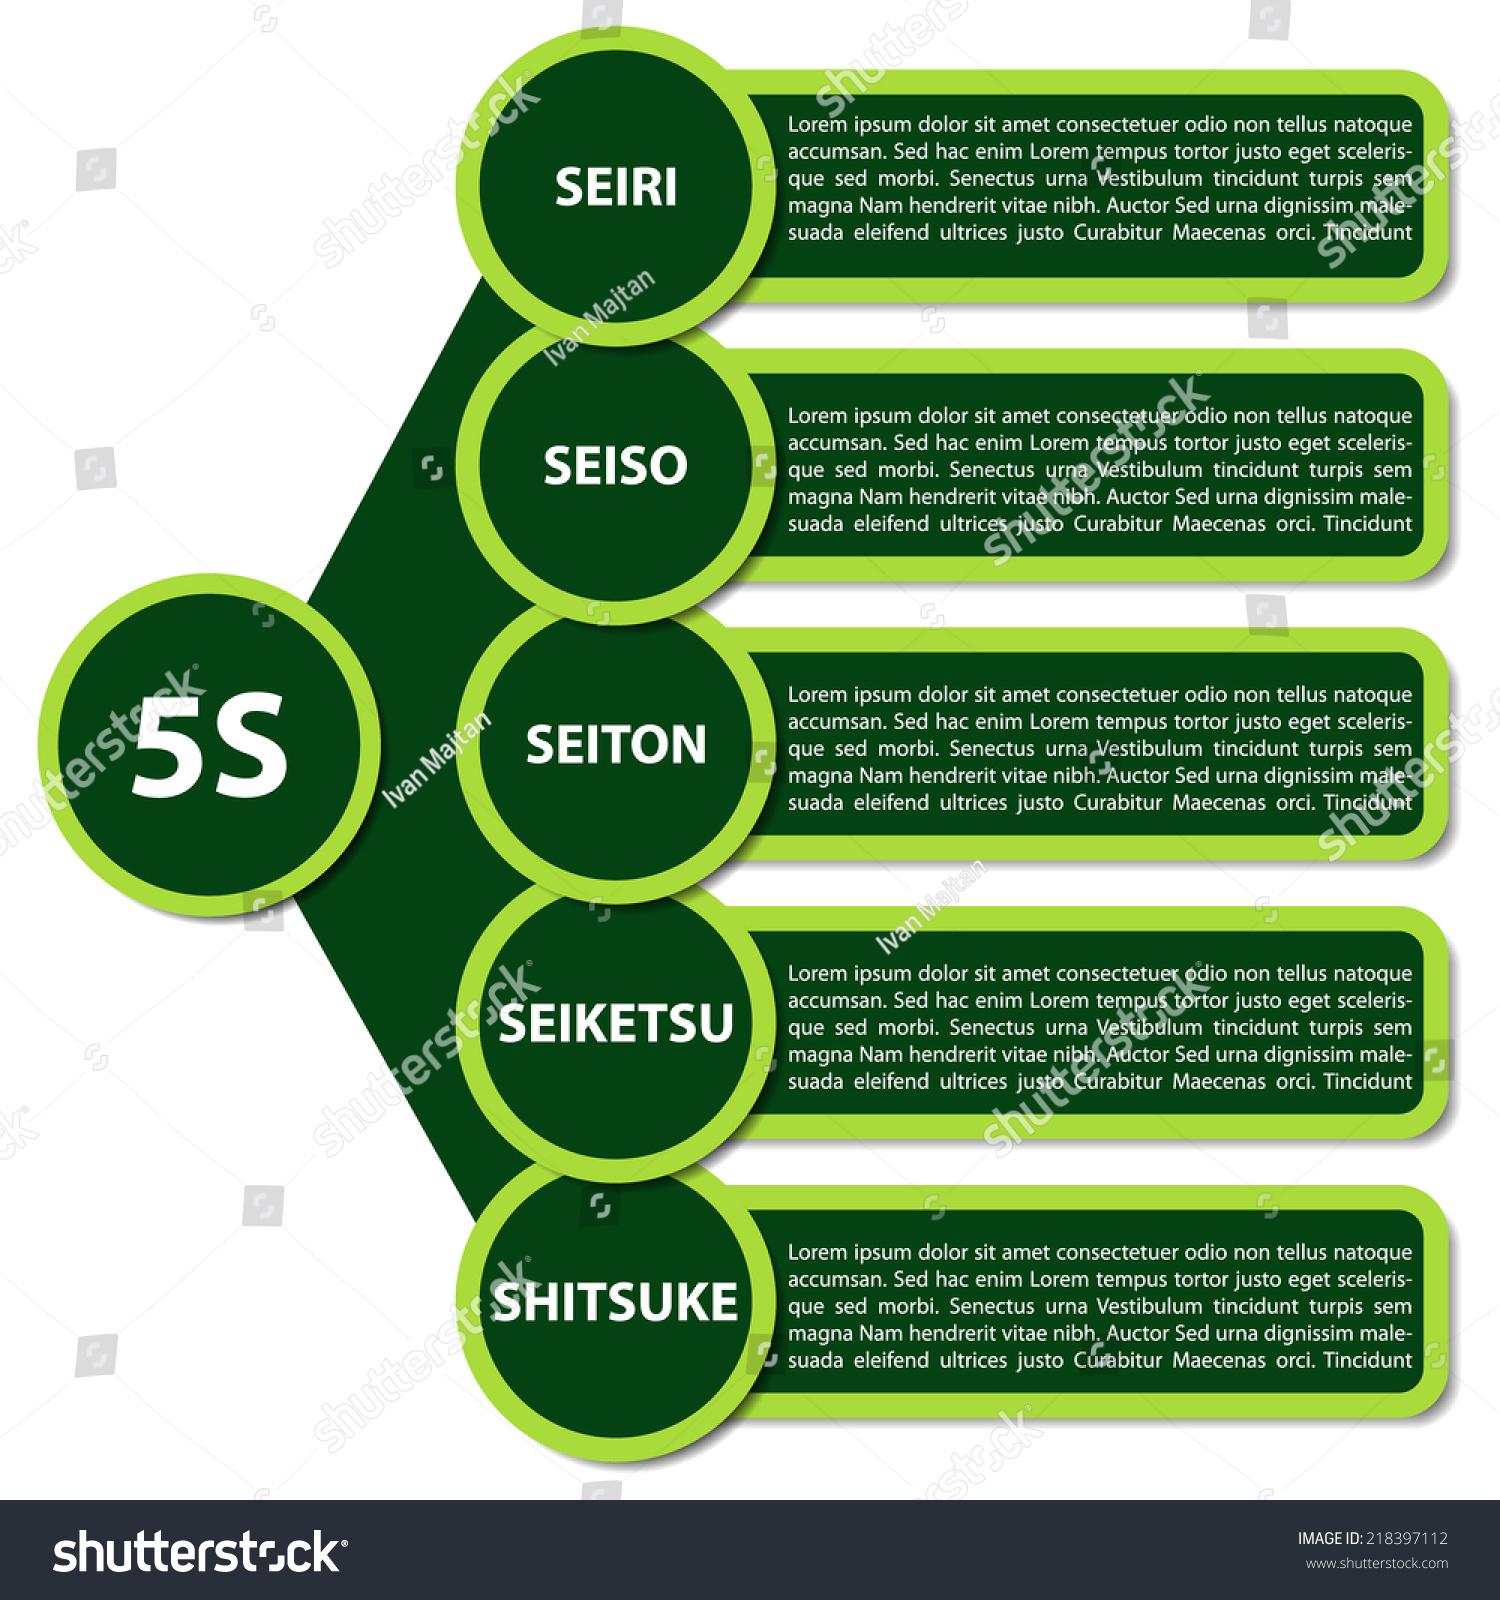 Illustration Strategy 5s Description Japanese Language